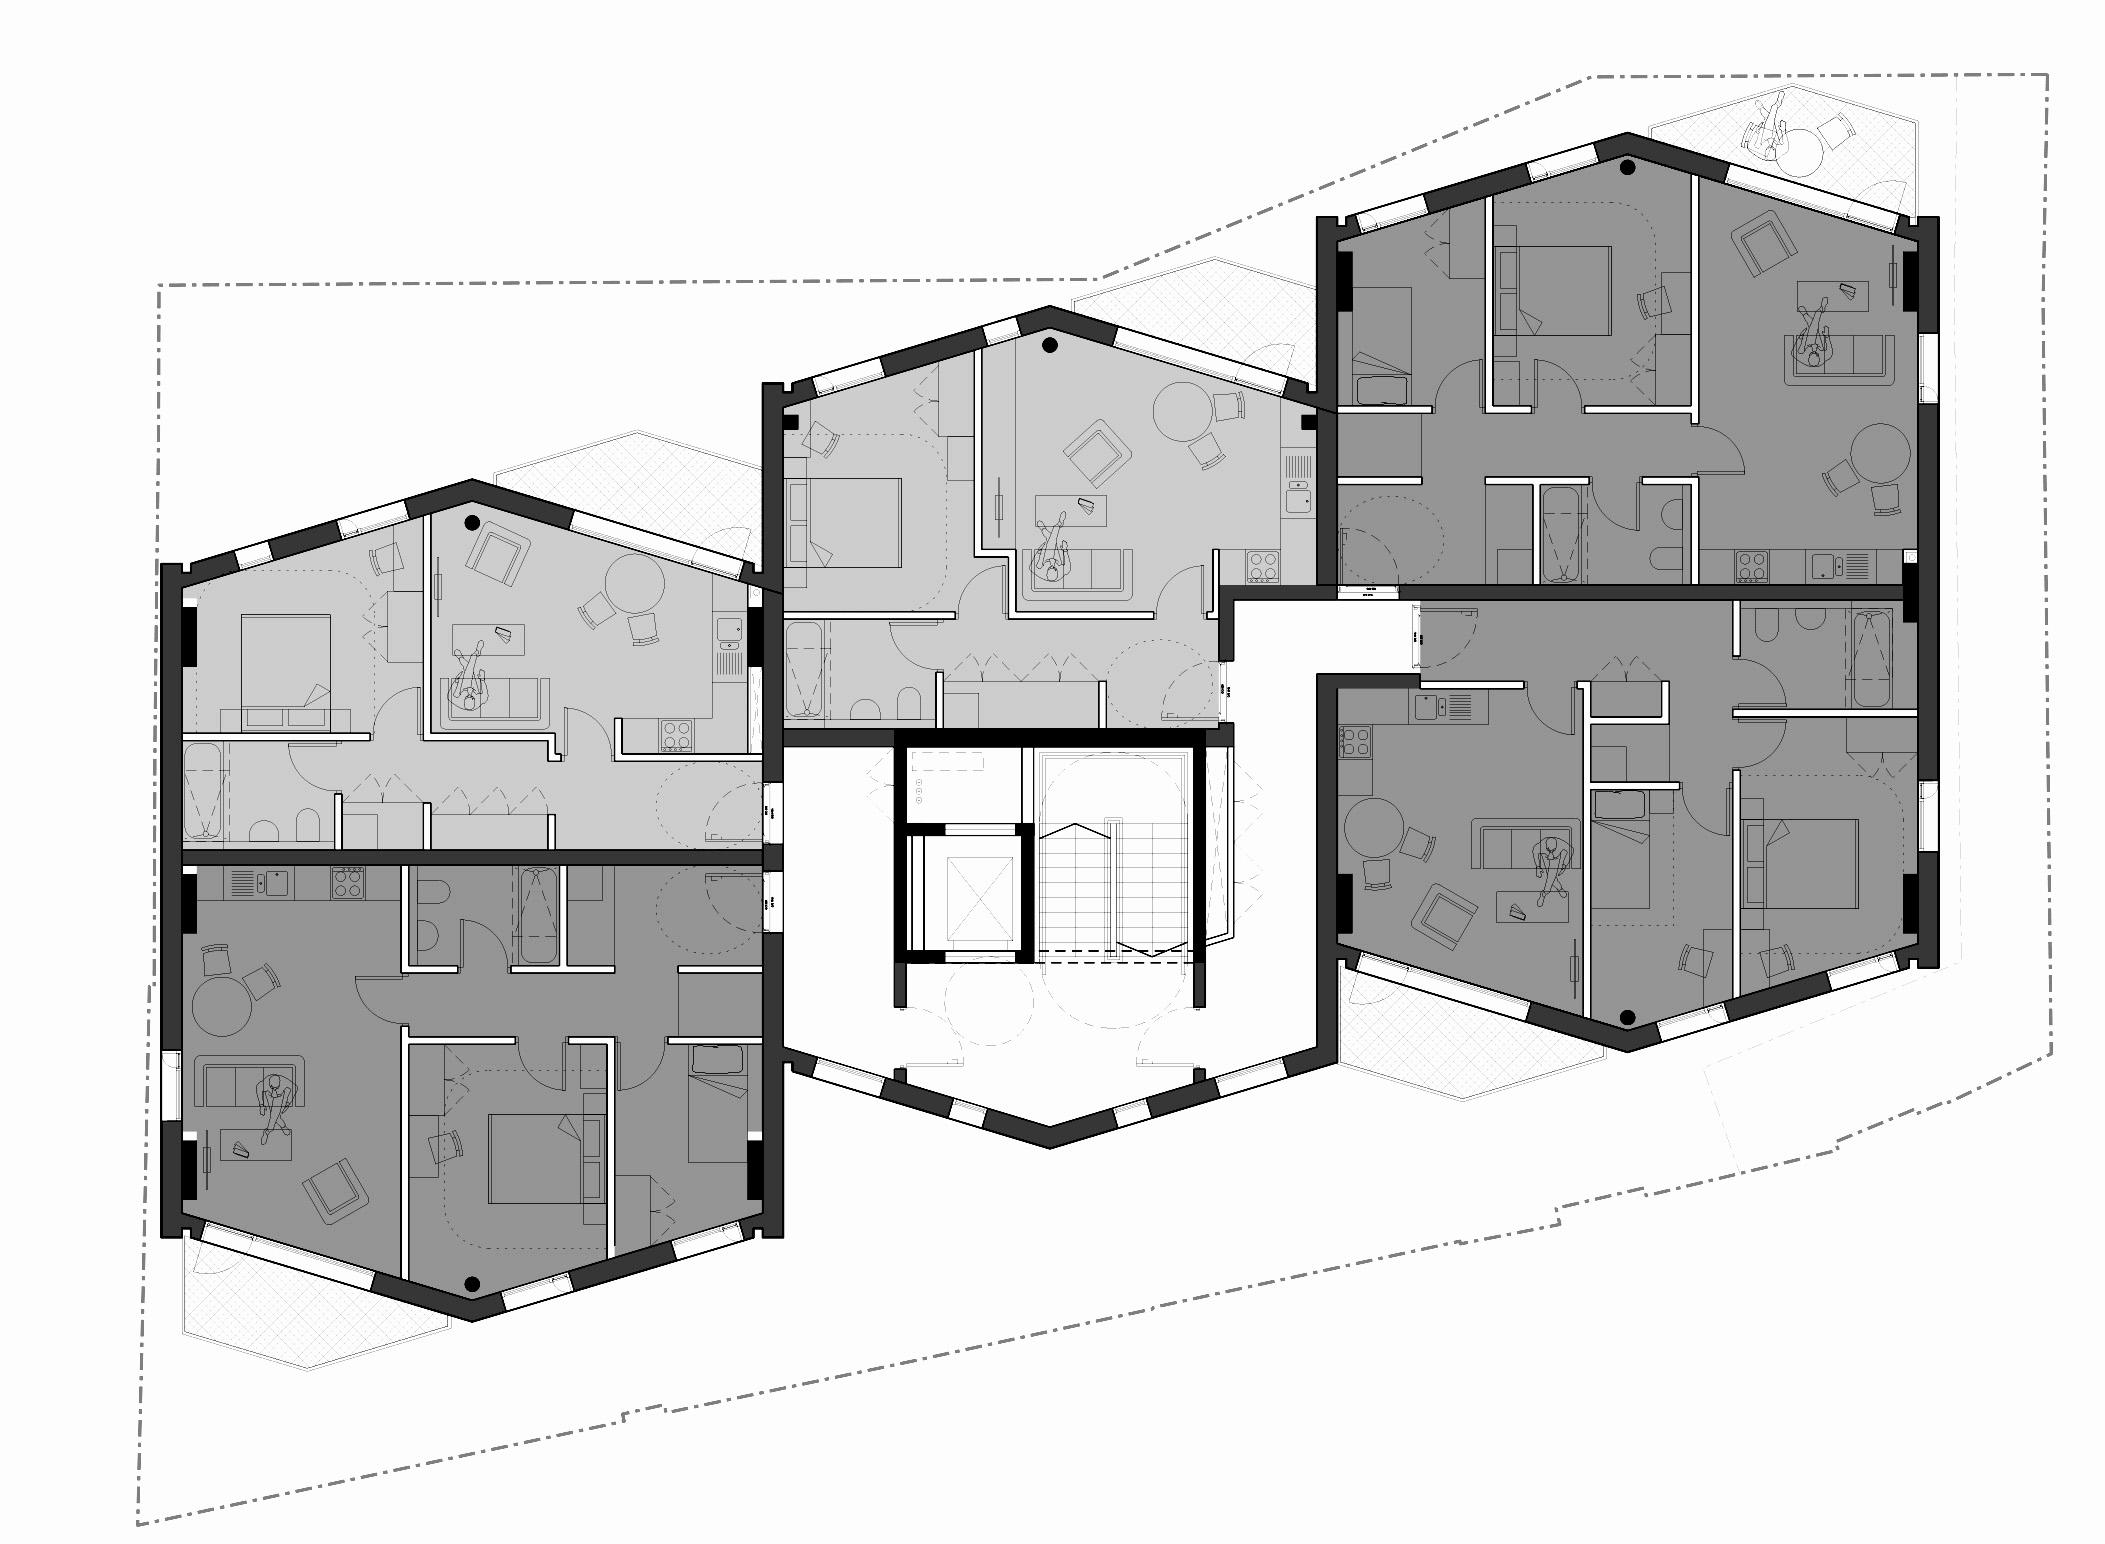 Plan_Typical upper level_Grey.jpg